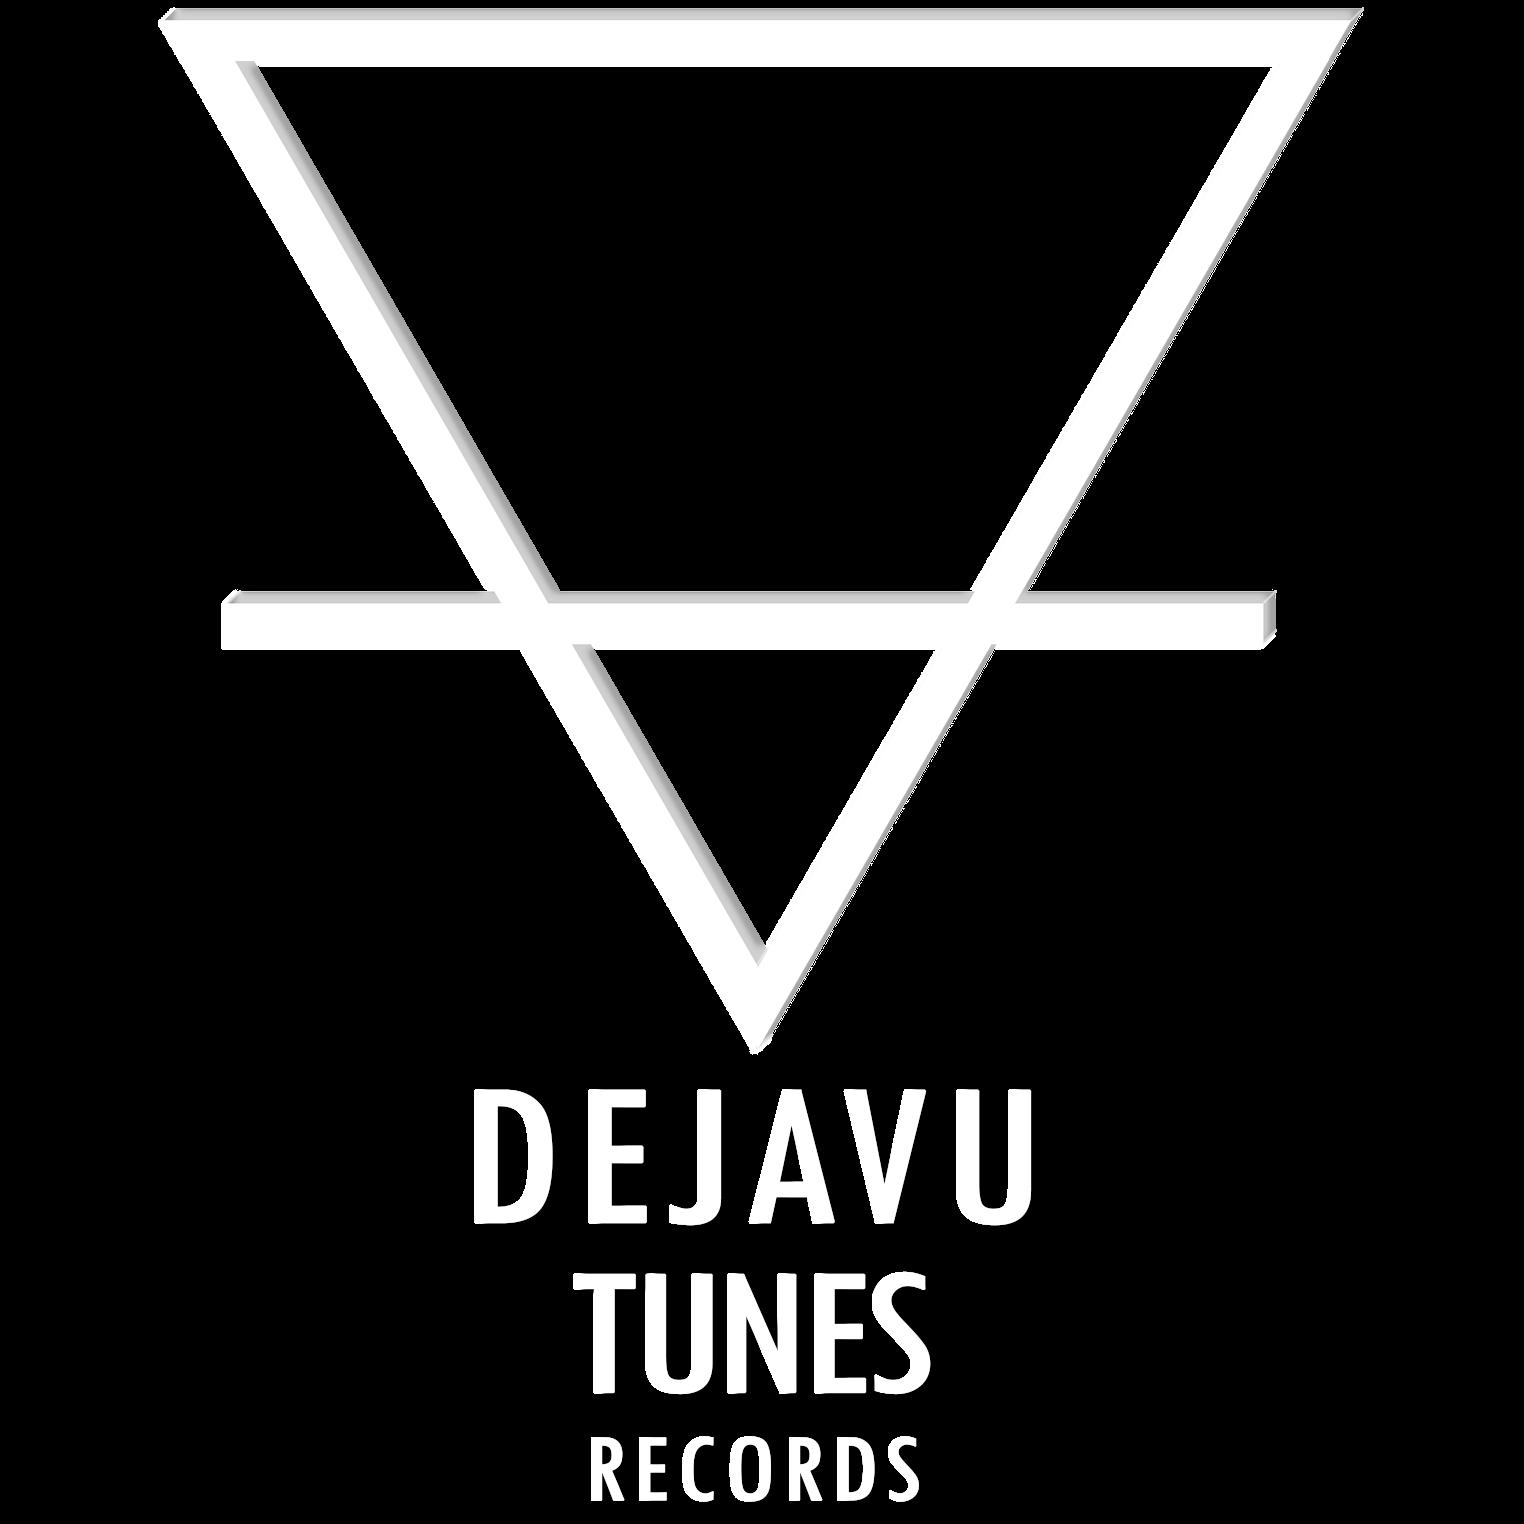 Dejavu Tunes Records